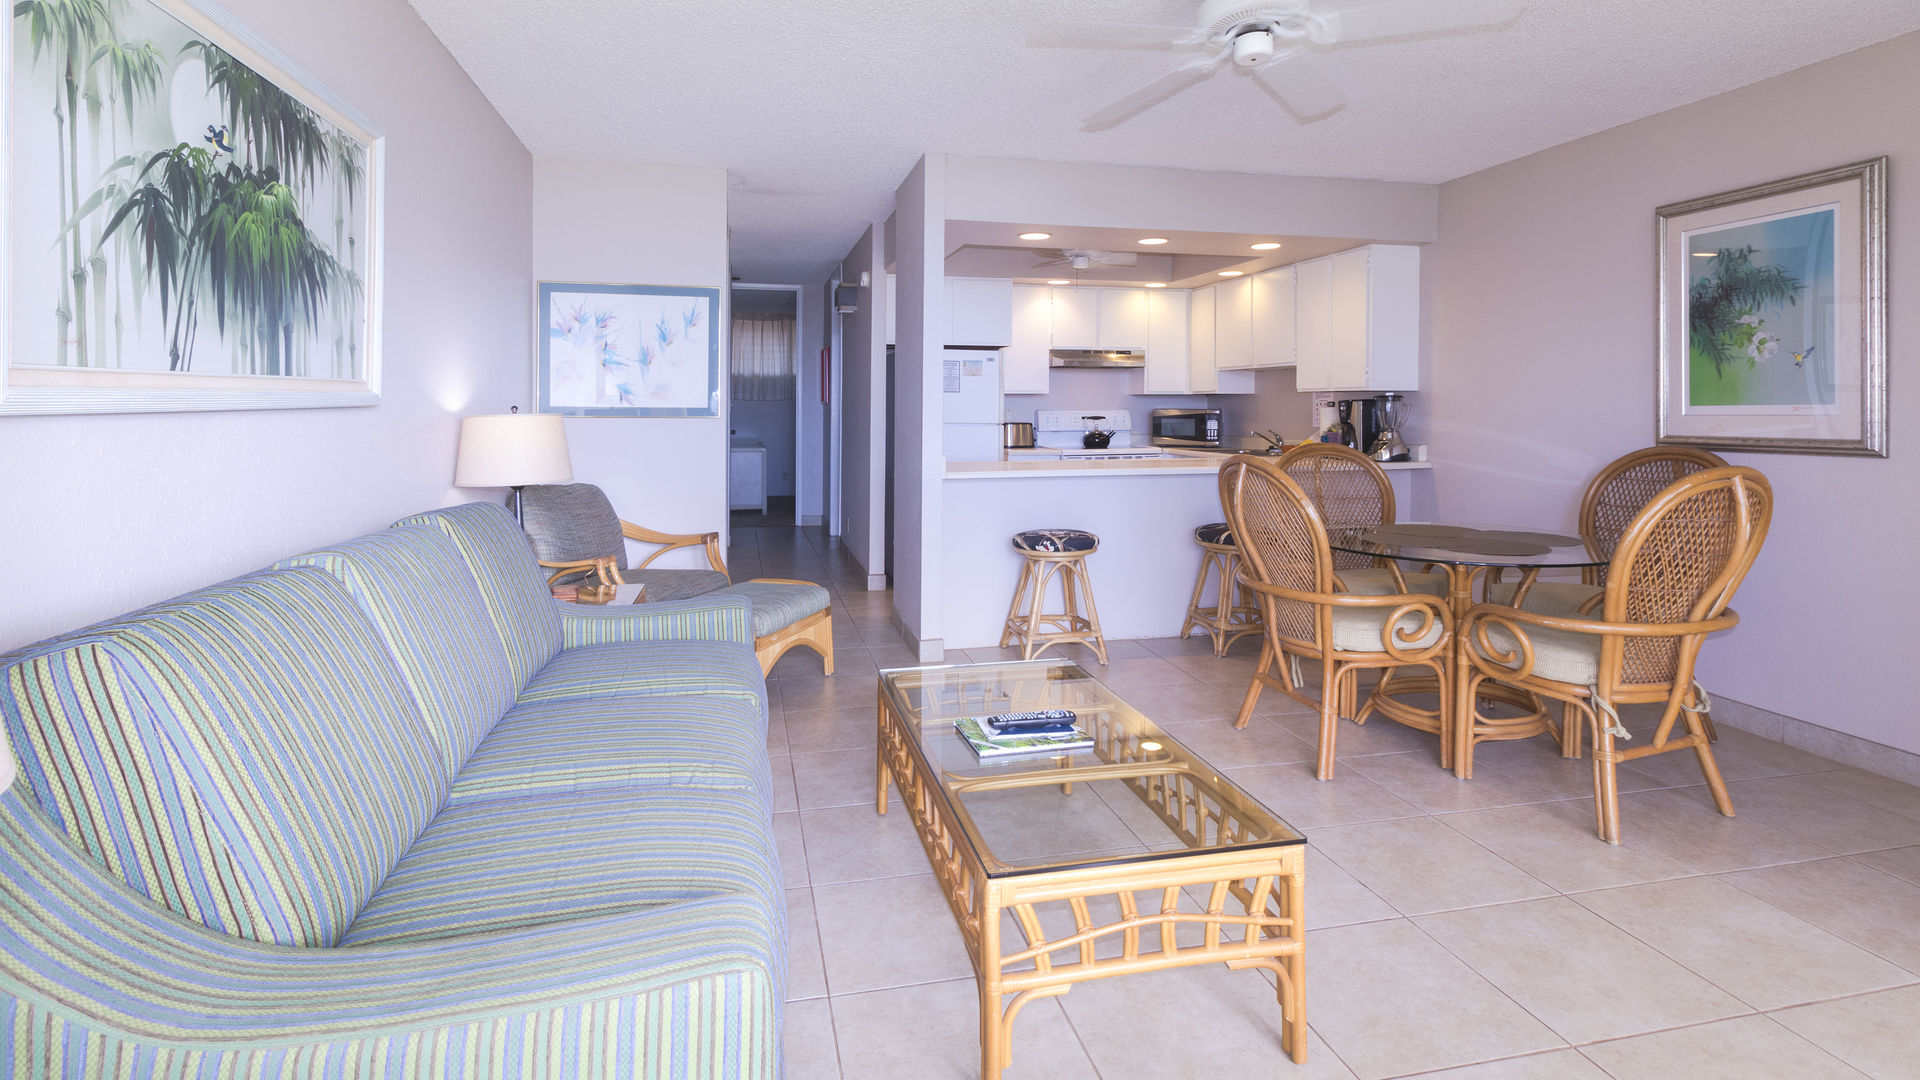 A206 View inward from Lanai, Sofa, Dining and Kitchen